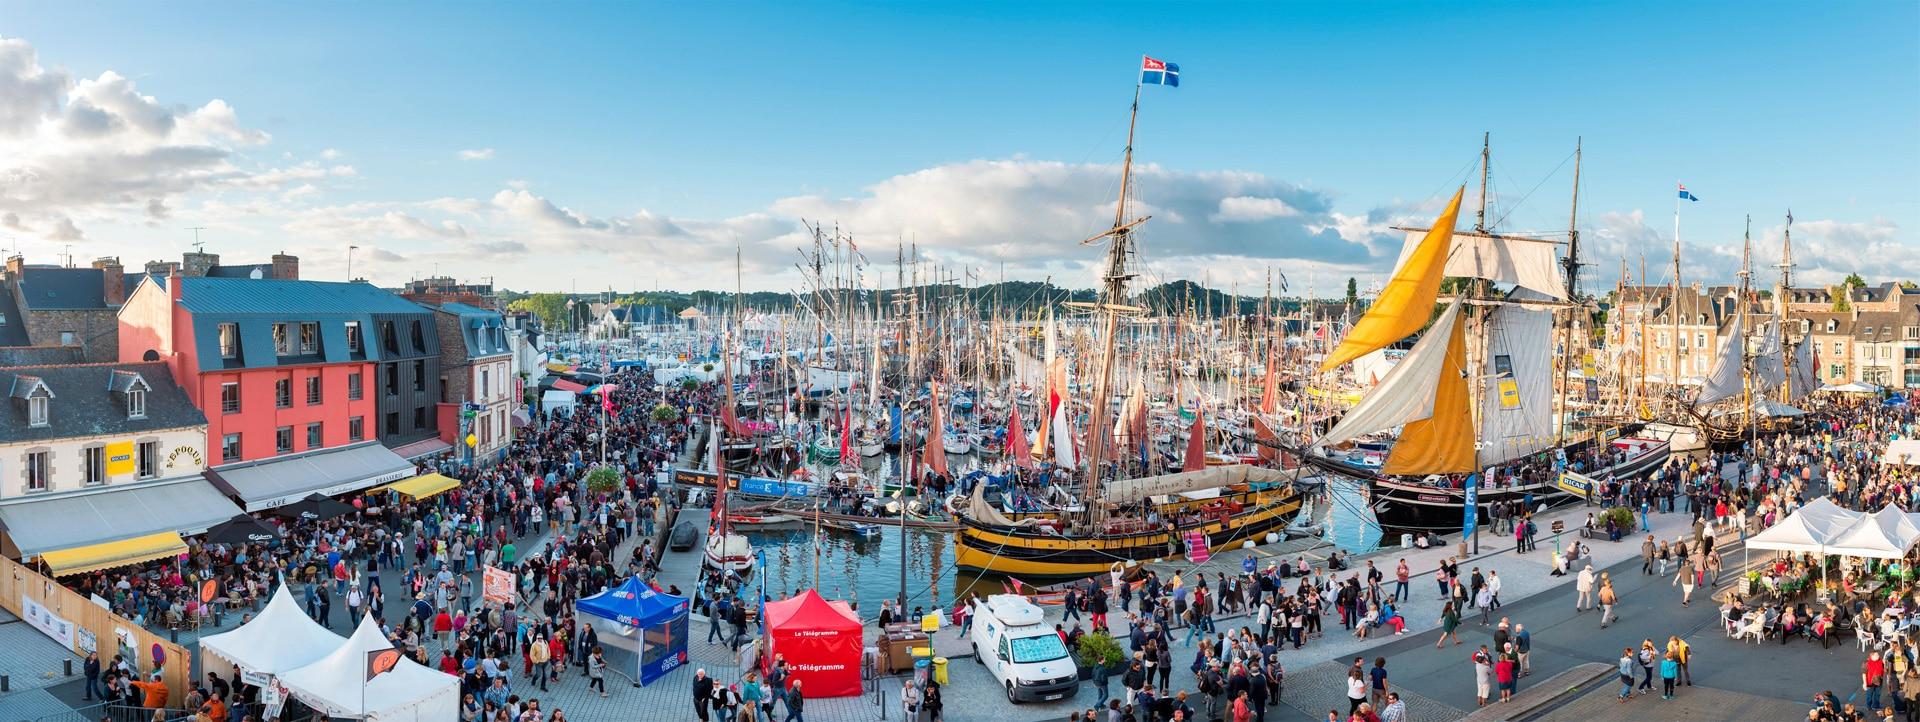 Paimpol-sailing-festival